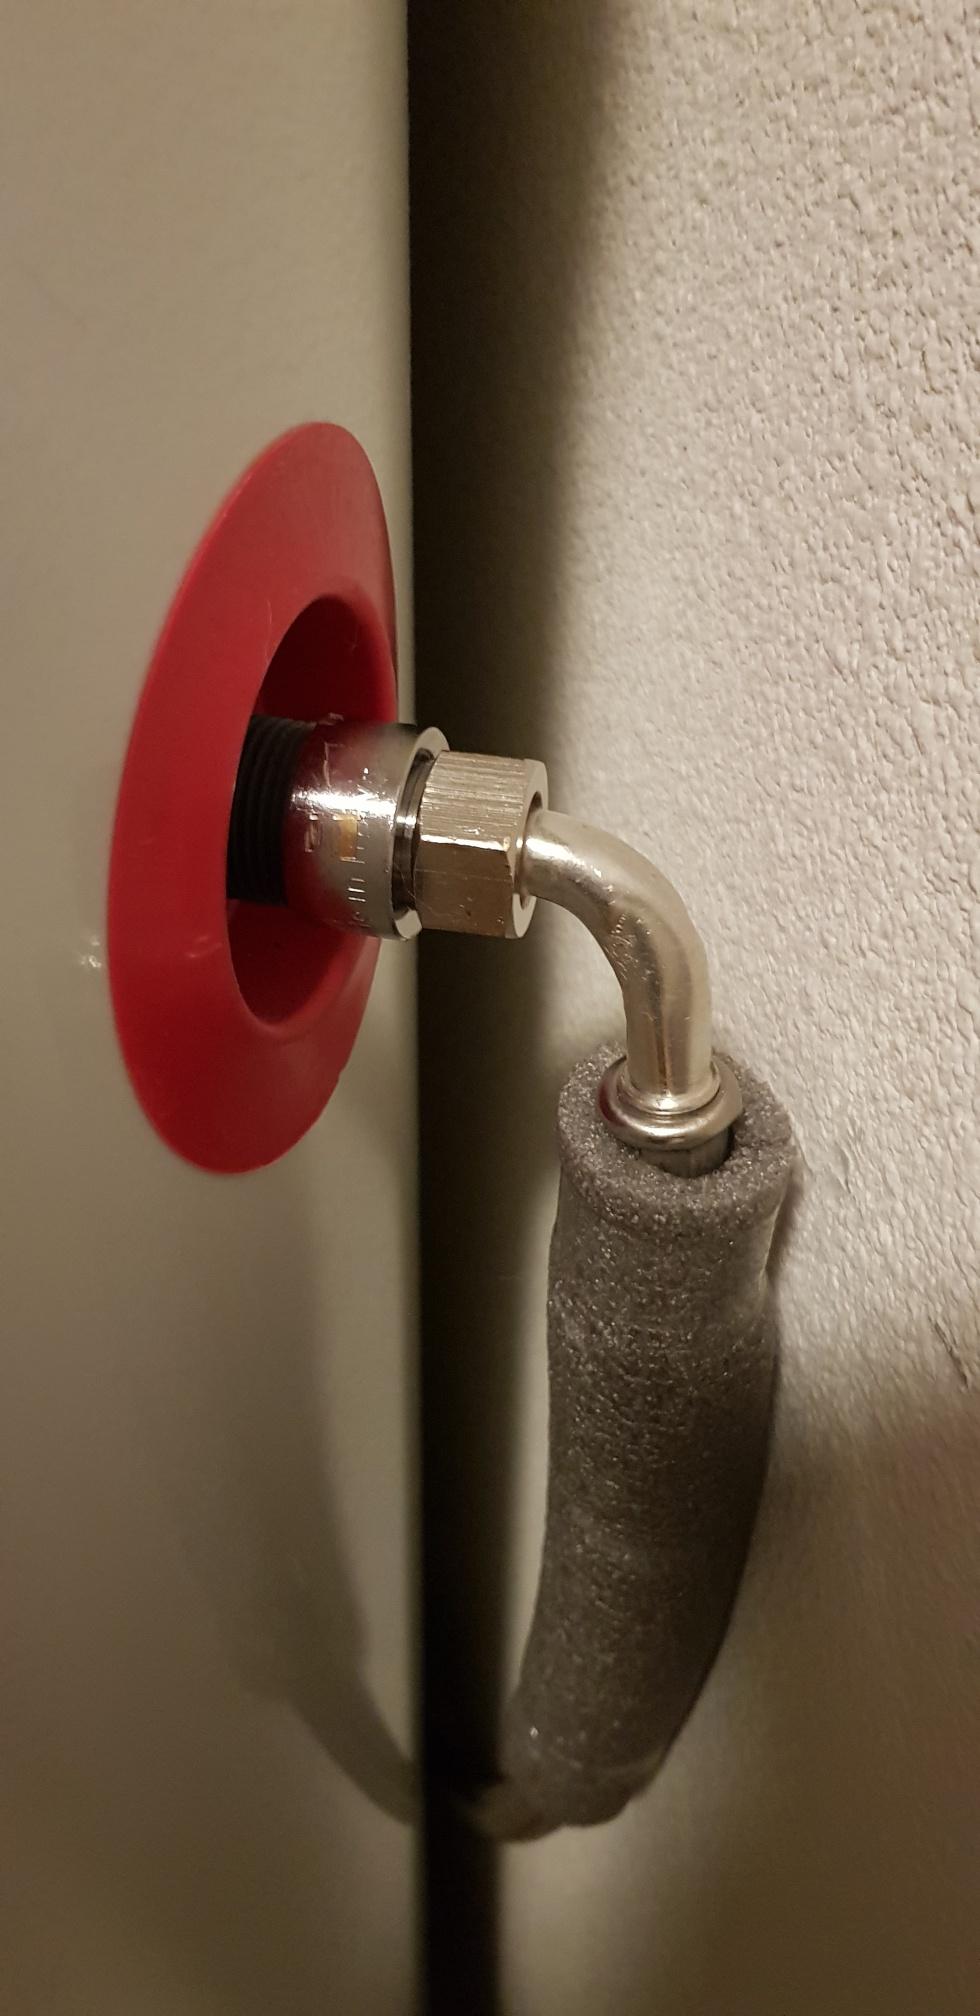 http://thido.nl/images/flex_boiler.jpg